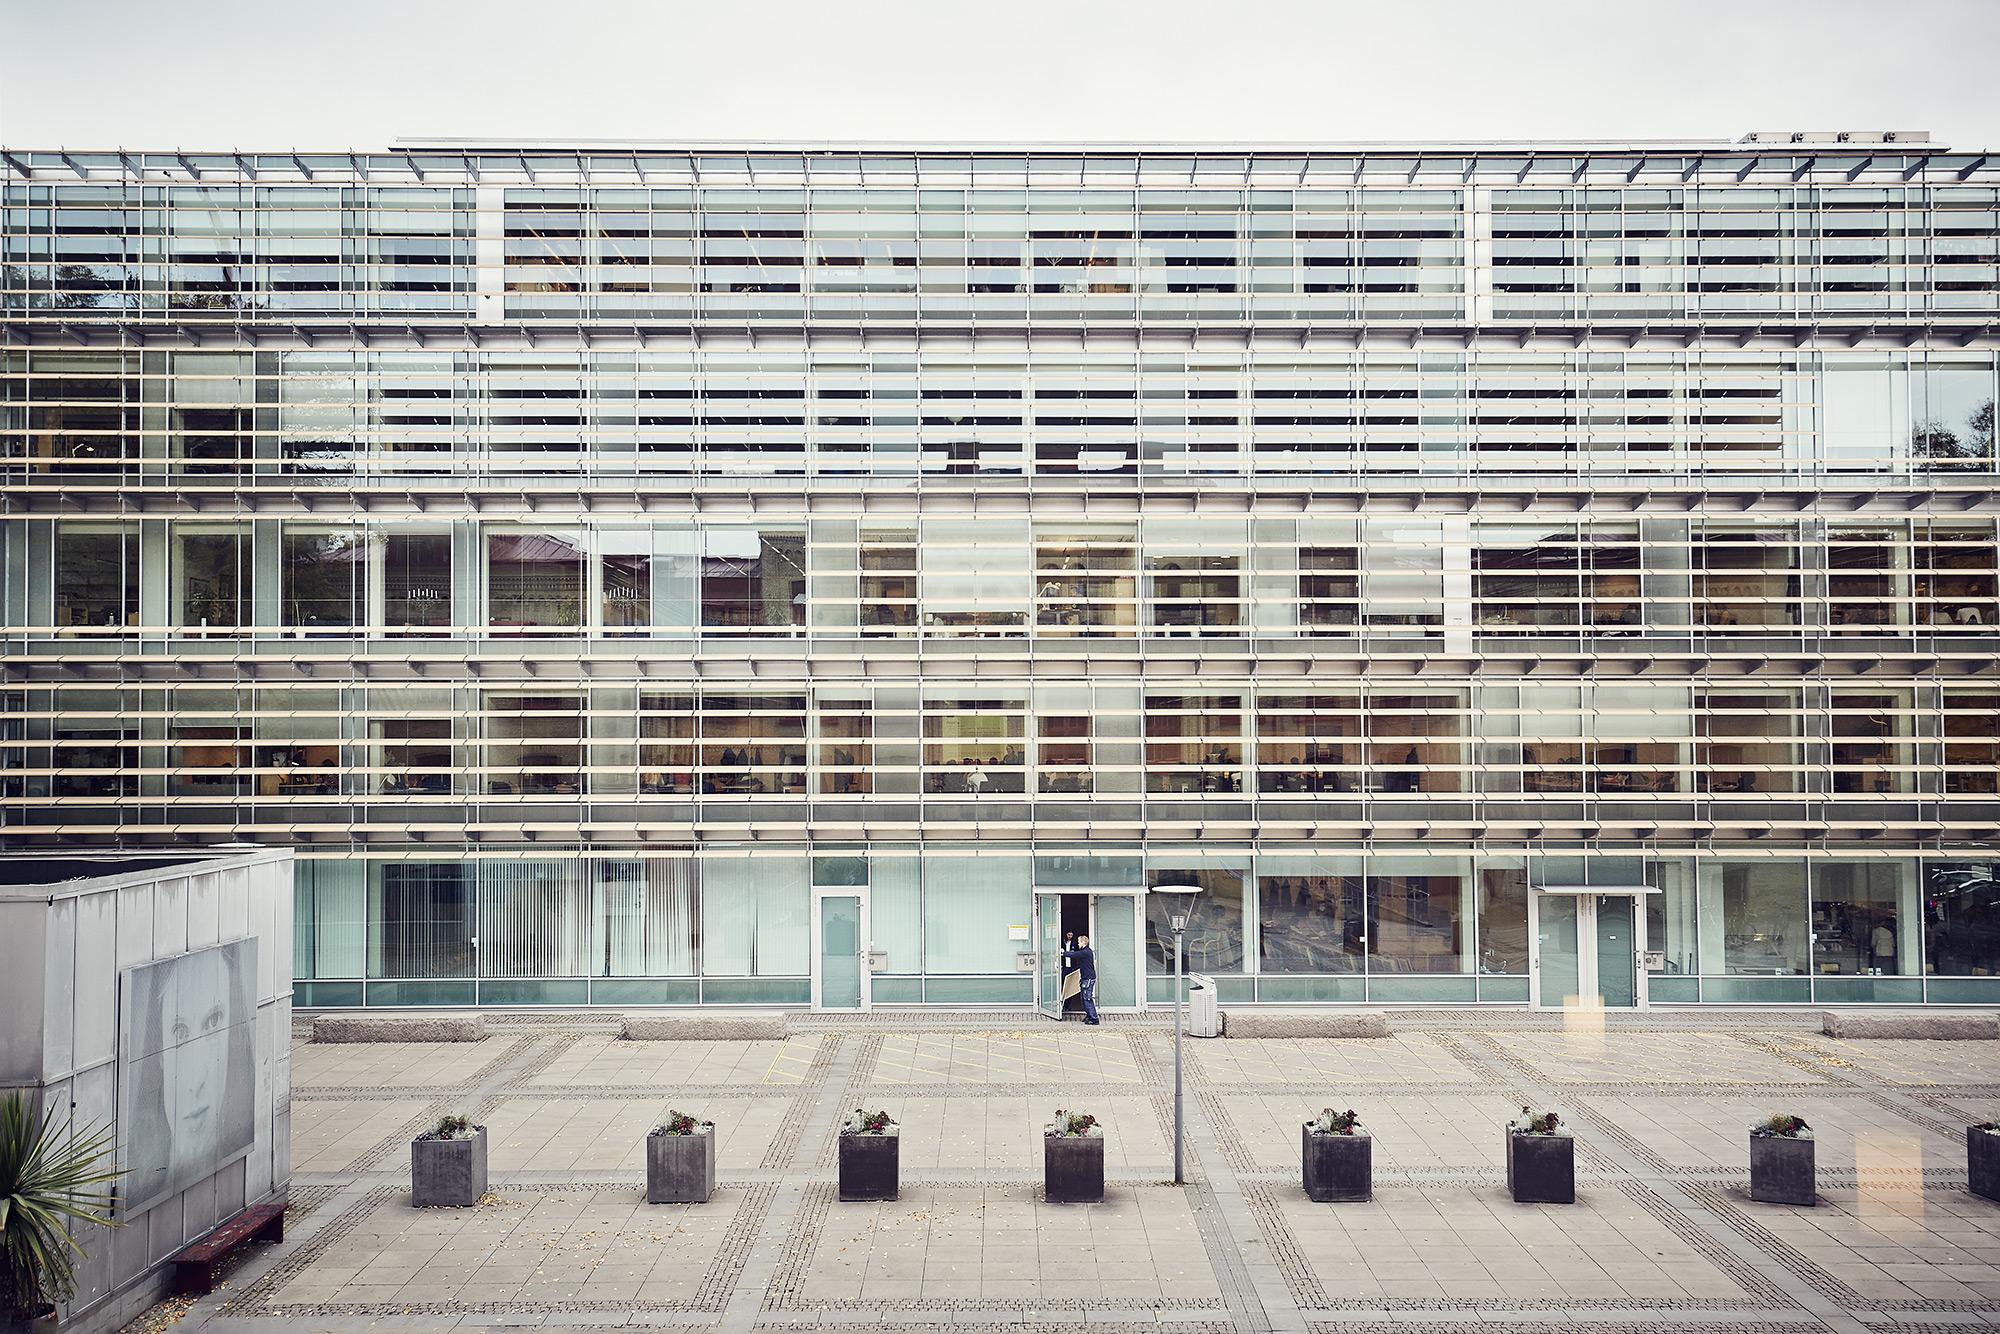 Pedagogen Göteborgs universitet